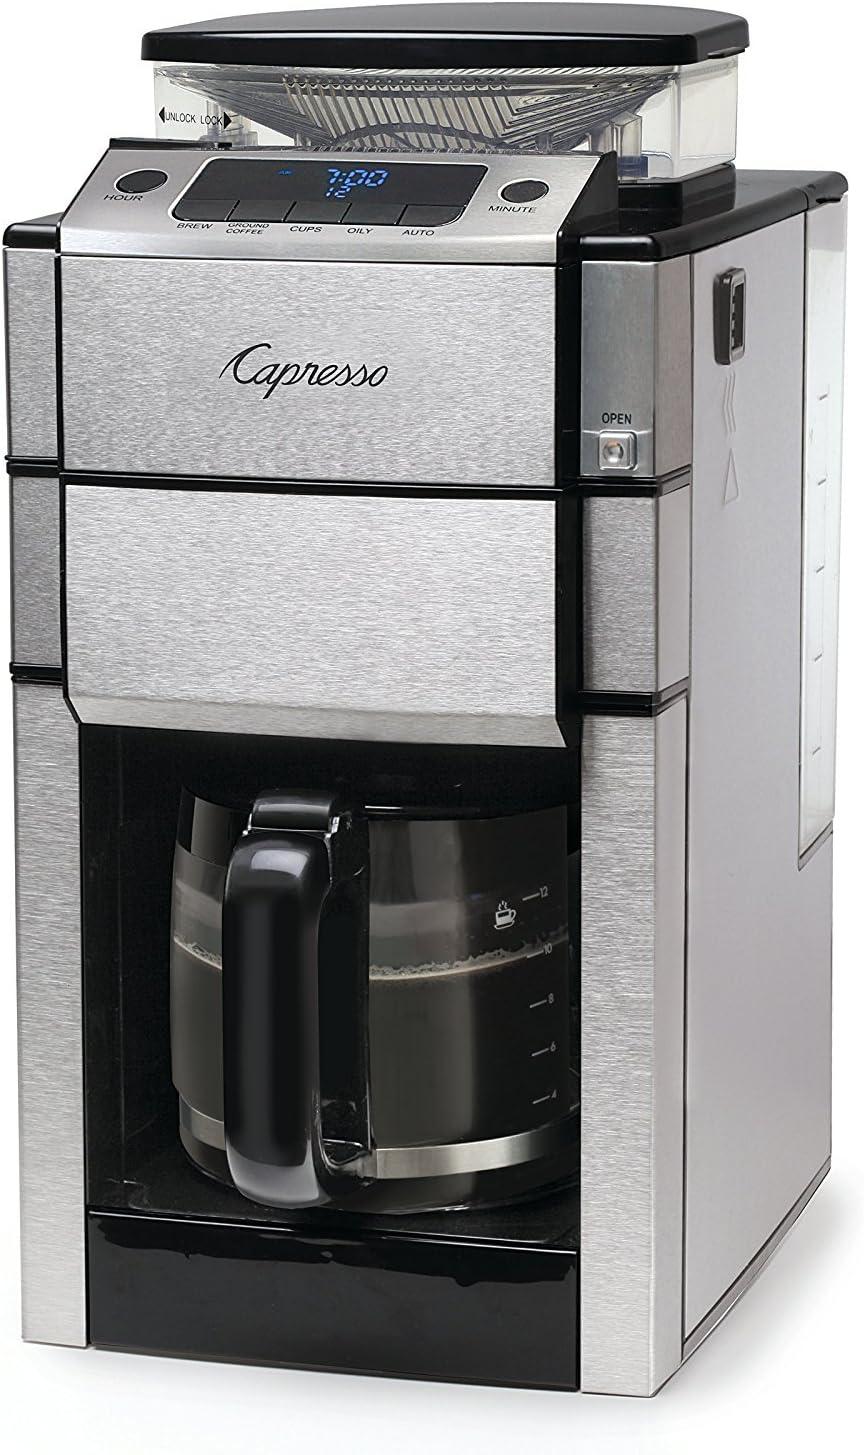 Capresso CoffeeTEAM PRO Plus 487.05